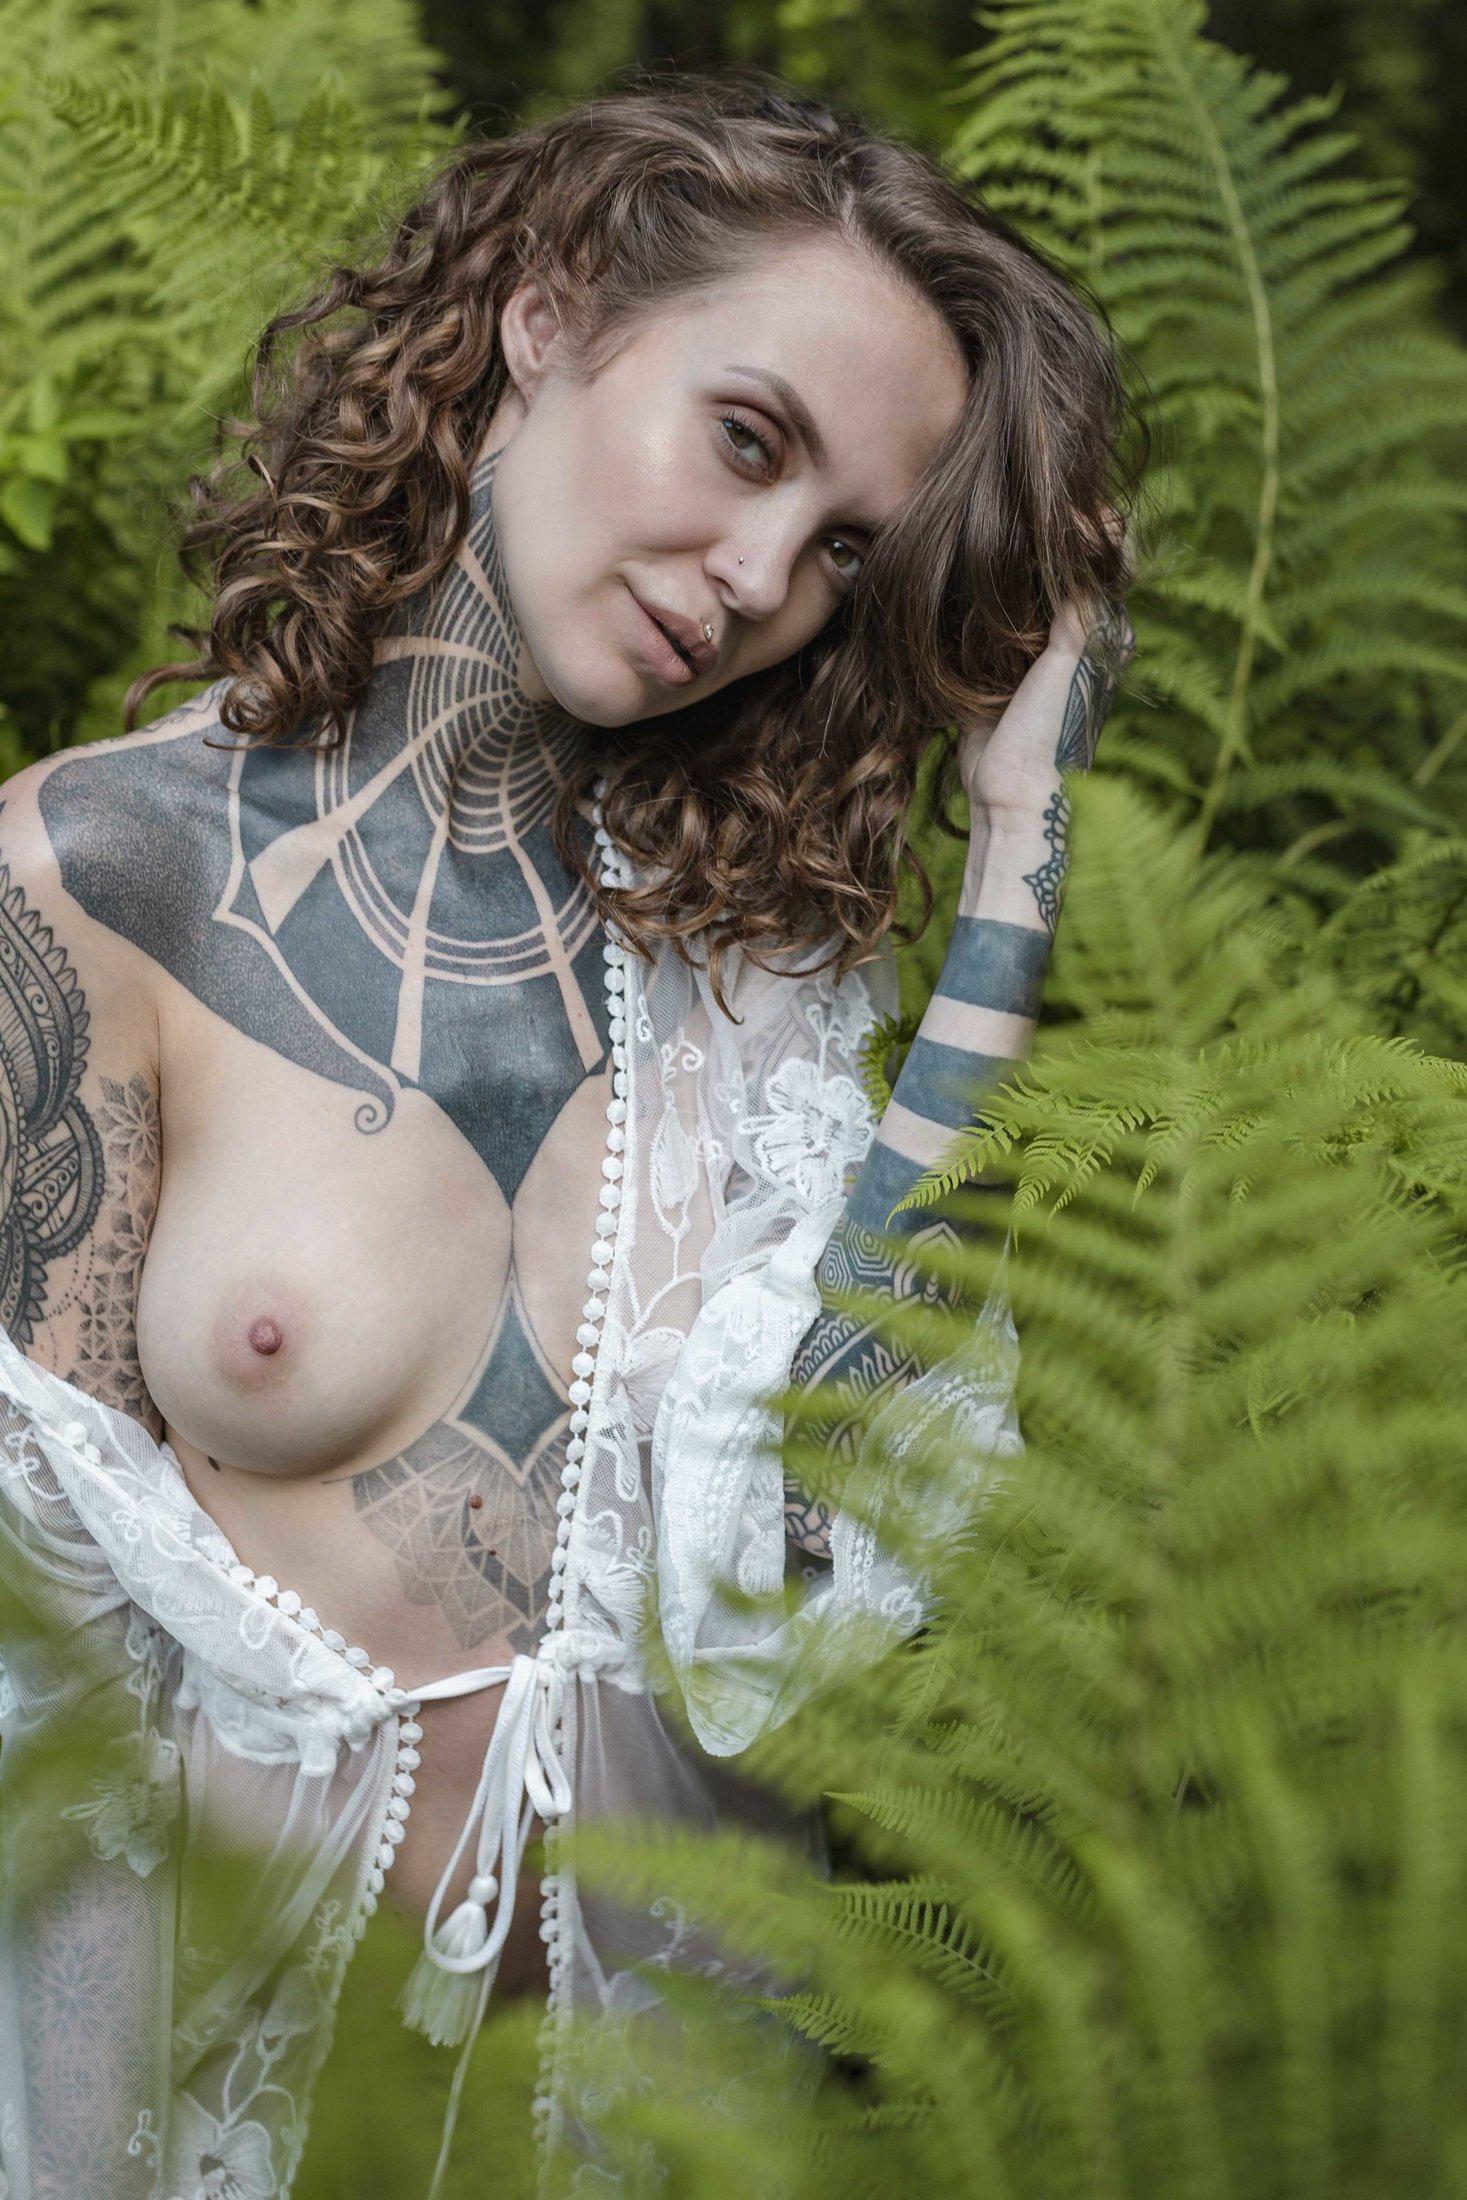 Celia Llopart - Gildo Cassimo photoshoot